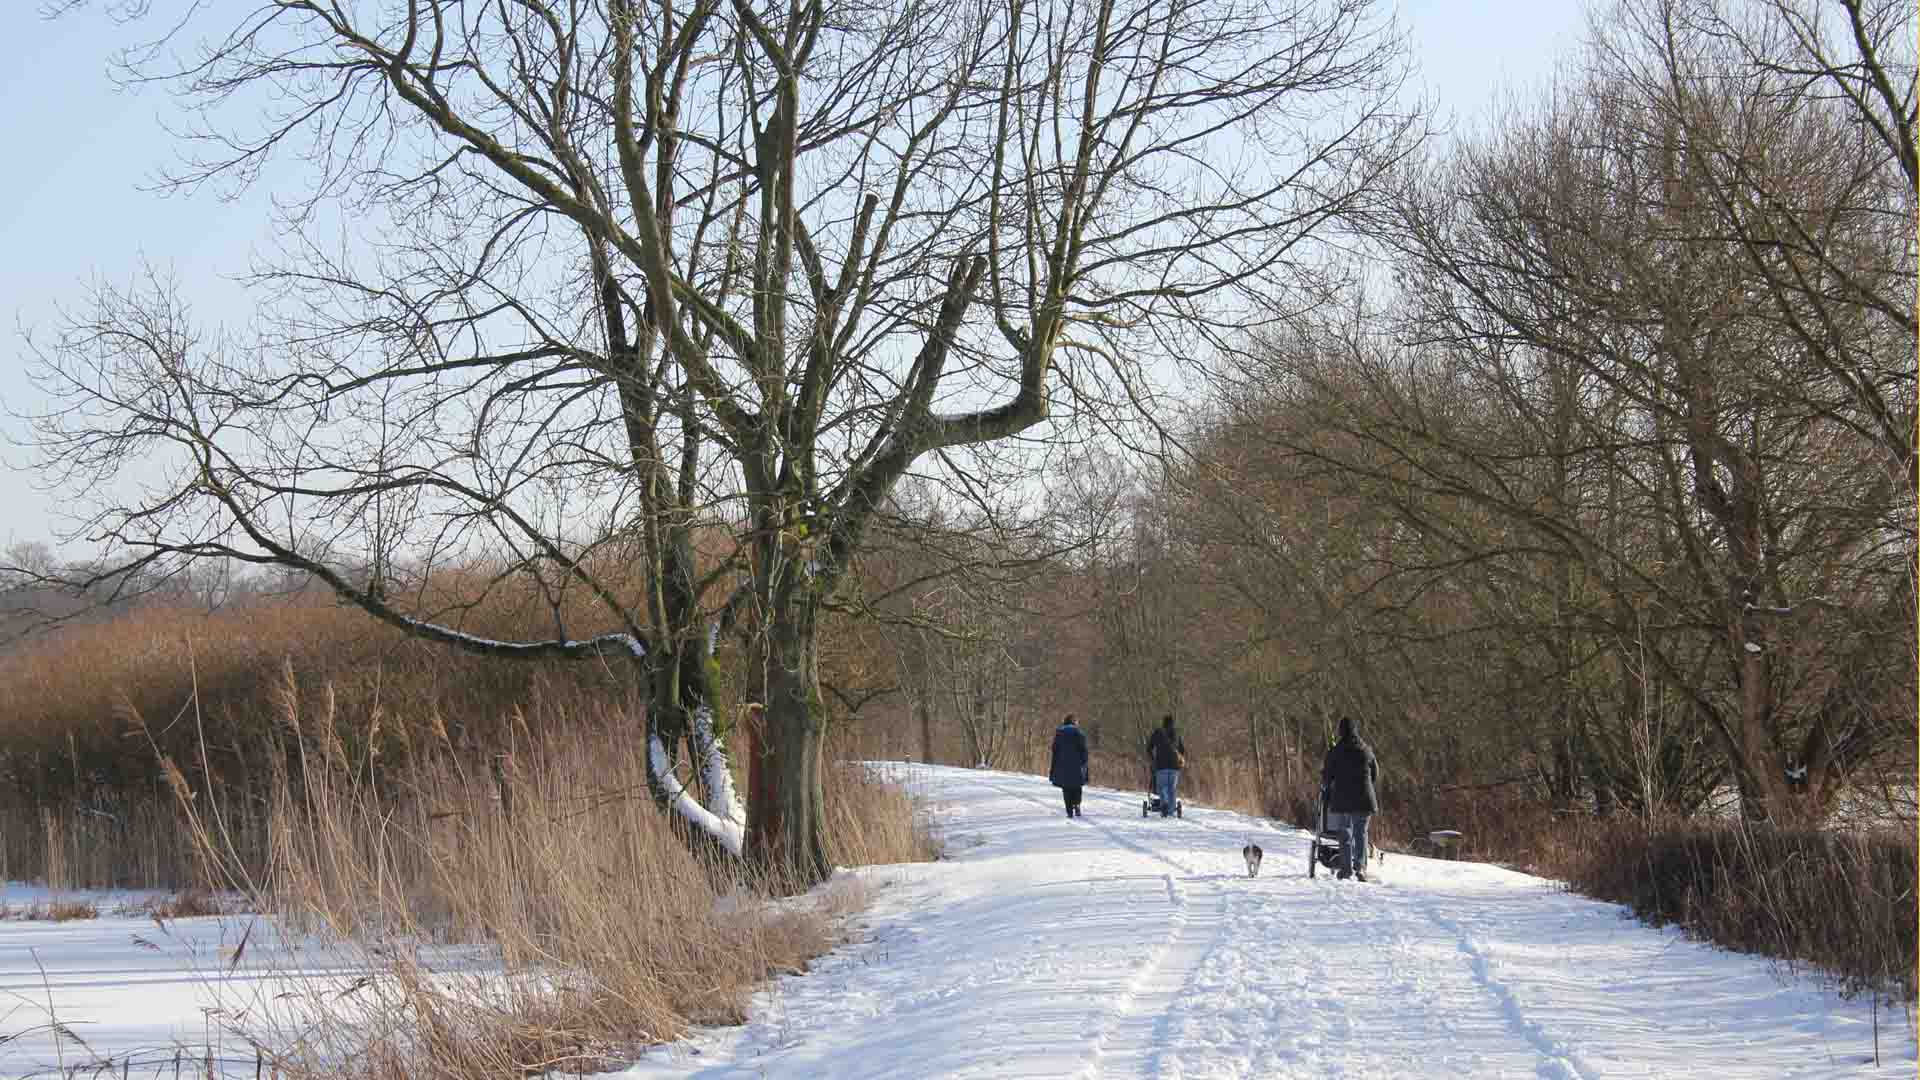 celle-dammaschwiese-winter